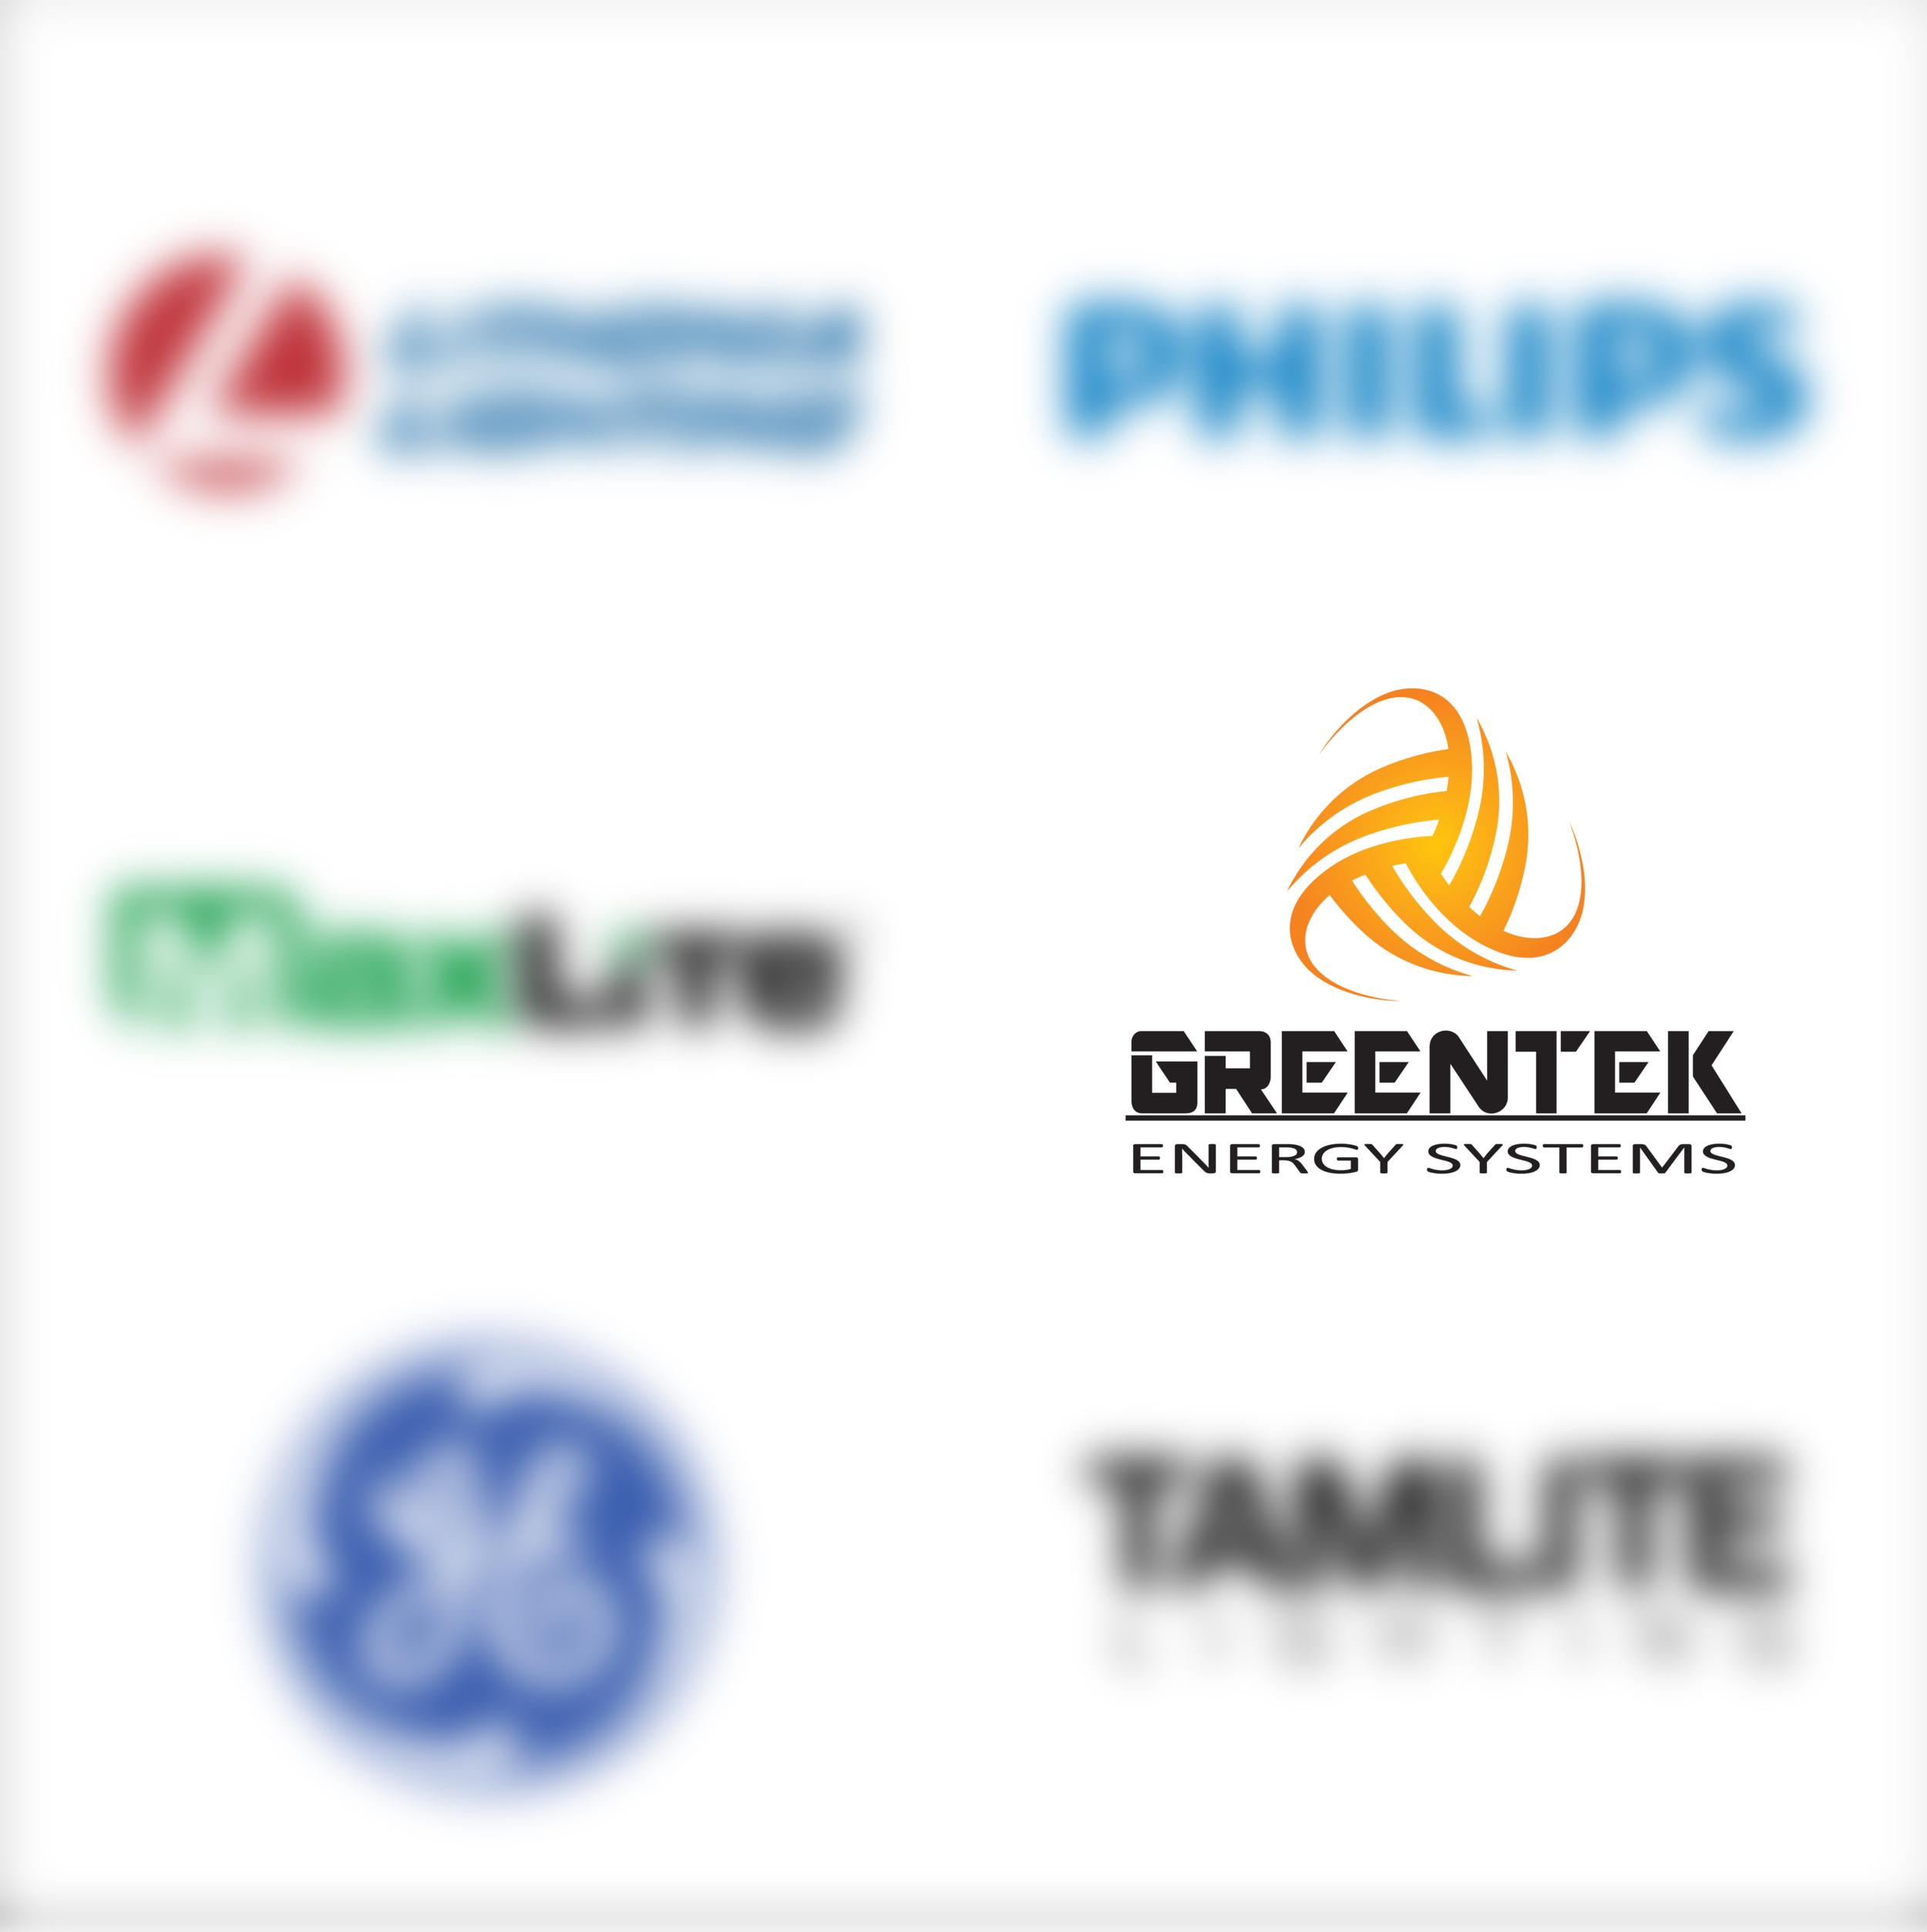 Led manufacturer rep greentek